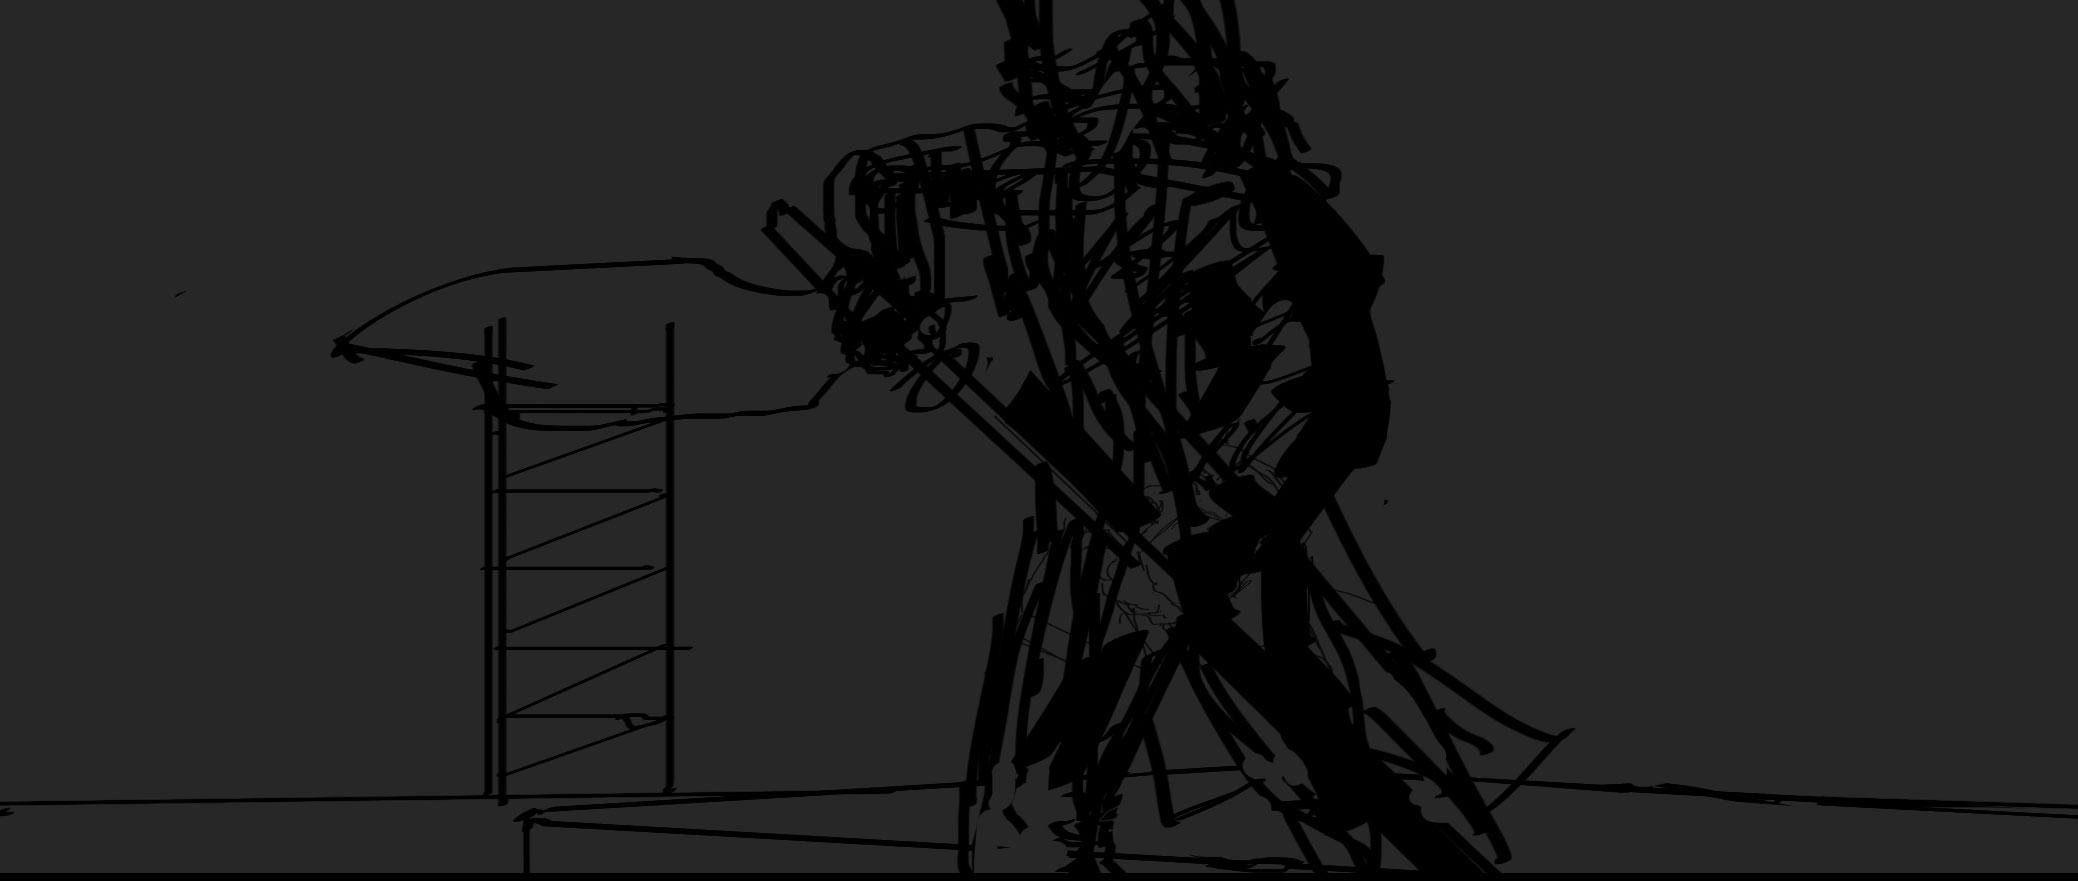 Wraiths_2019Animatic_Thumbsheet-02_116.jpg